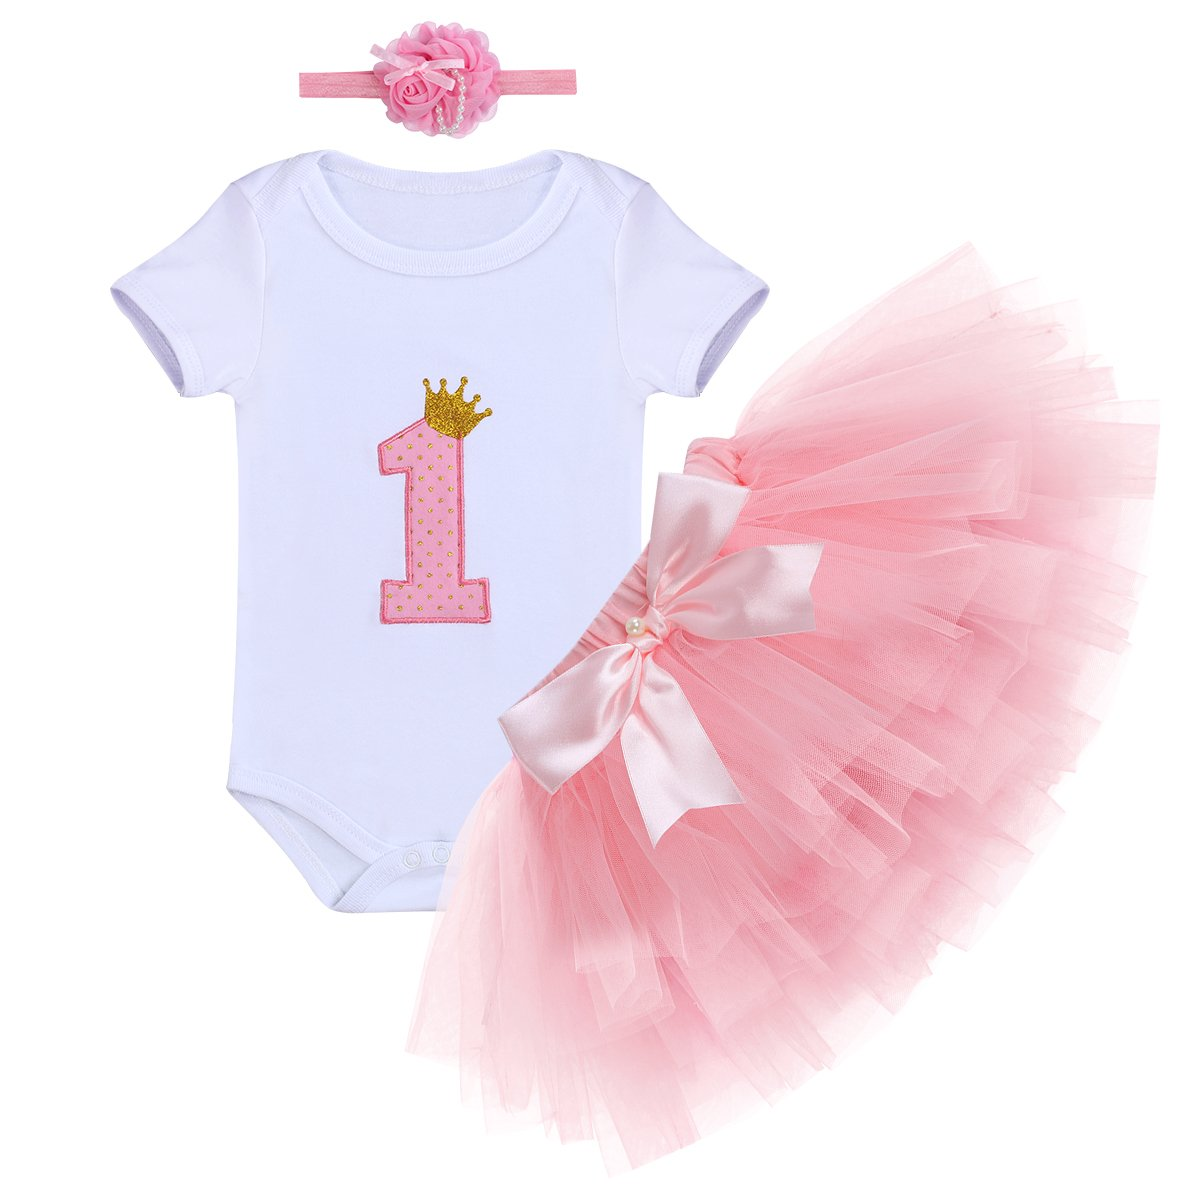 IBTOM CASTLE Baby Girl It's My 1st Birthday Outfits Cake Smash Crown